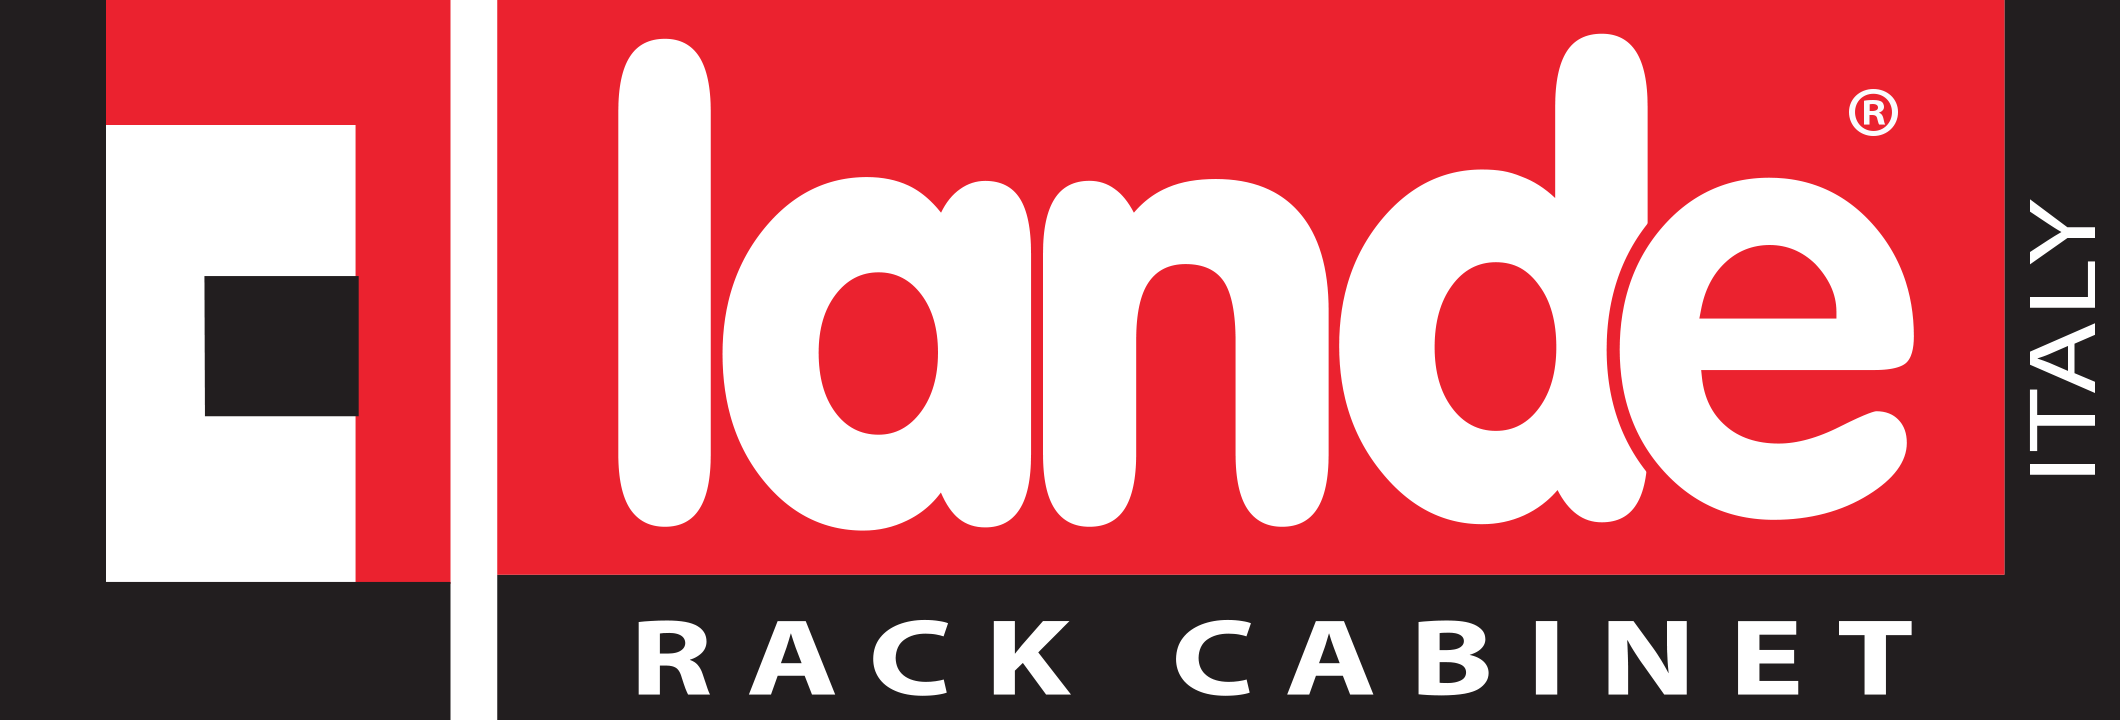 Logo-Lande-IT-copia.png